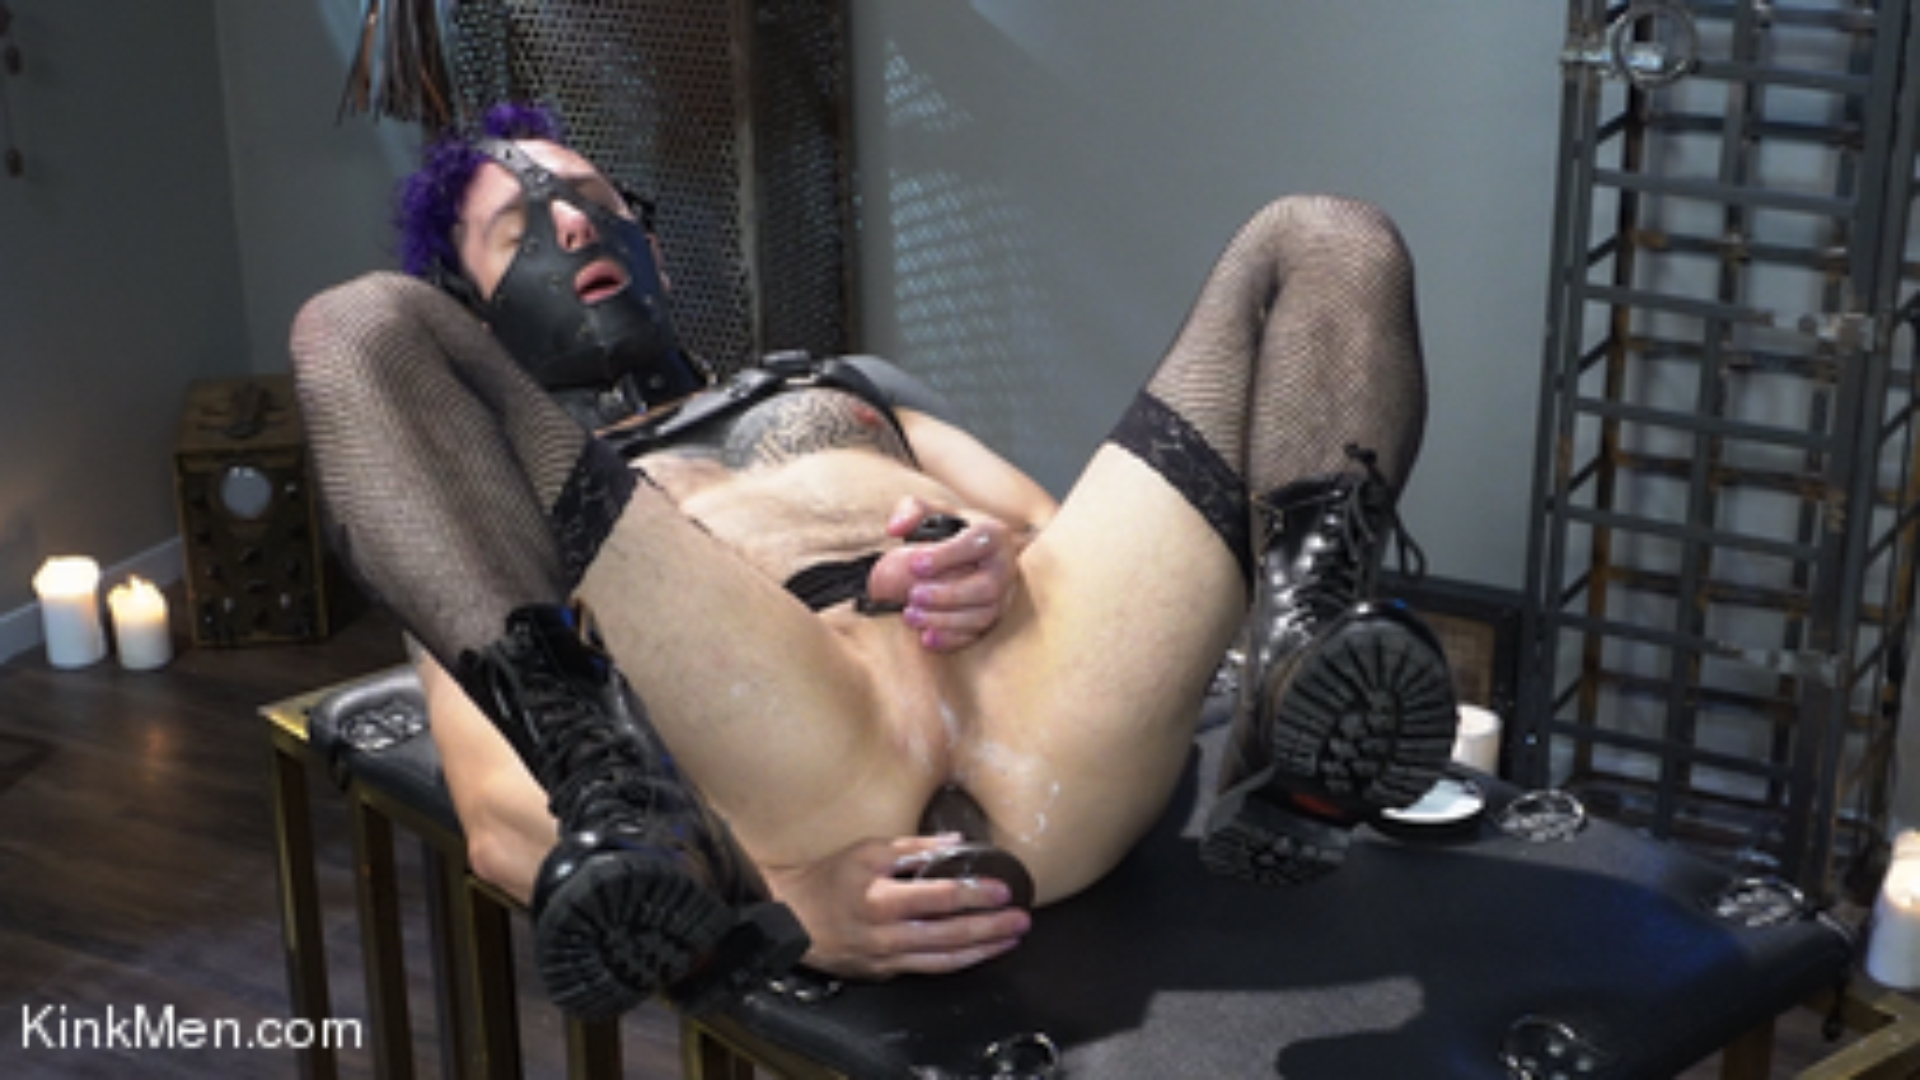 Photo number 3 from Corbin Dallas Is The Sneak shot for Kinky Bites Men on Kink.com. Featuring Corbin Dallas in hardcore BDSM & Fetish porn.